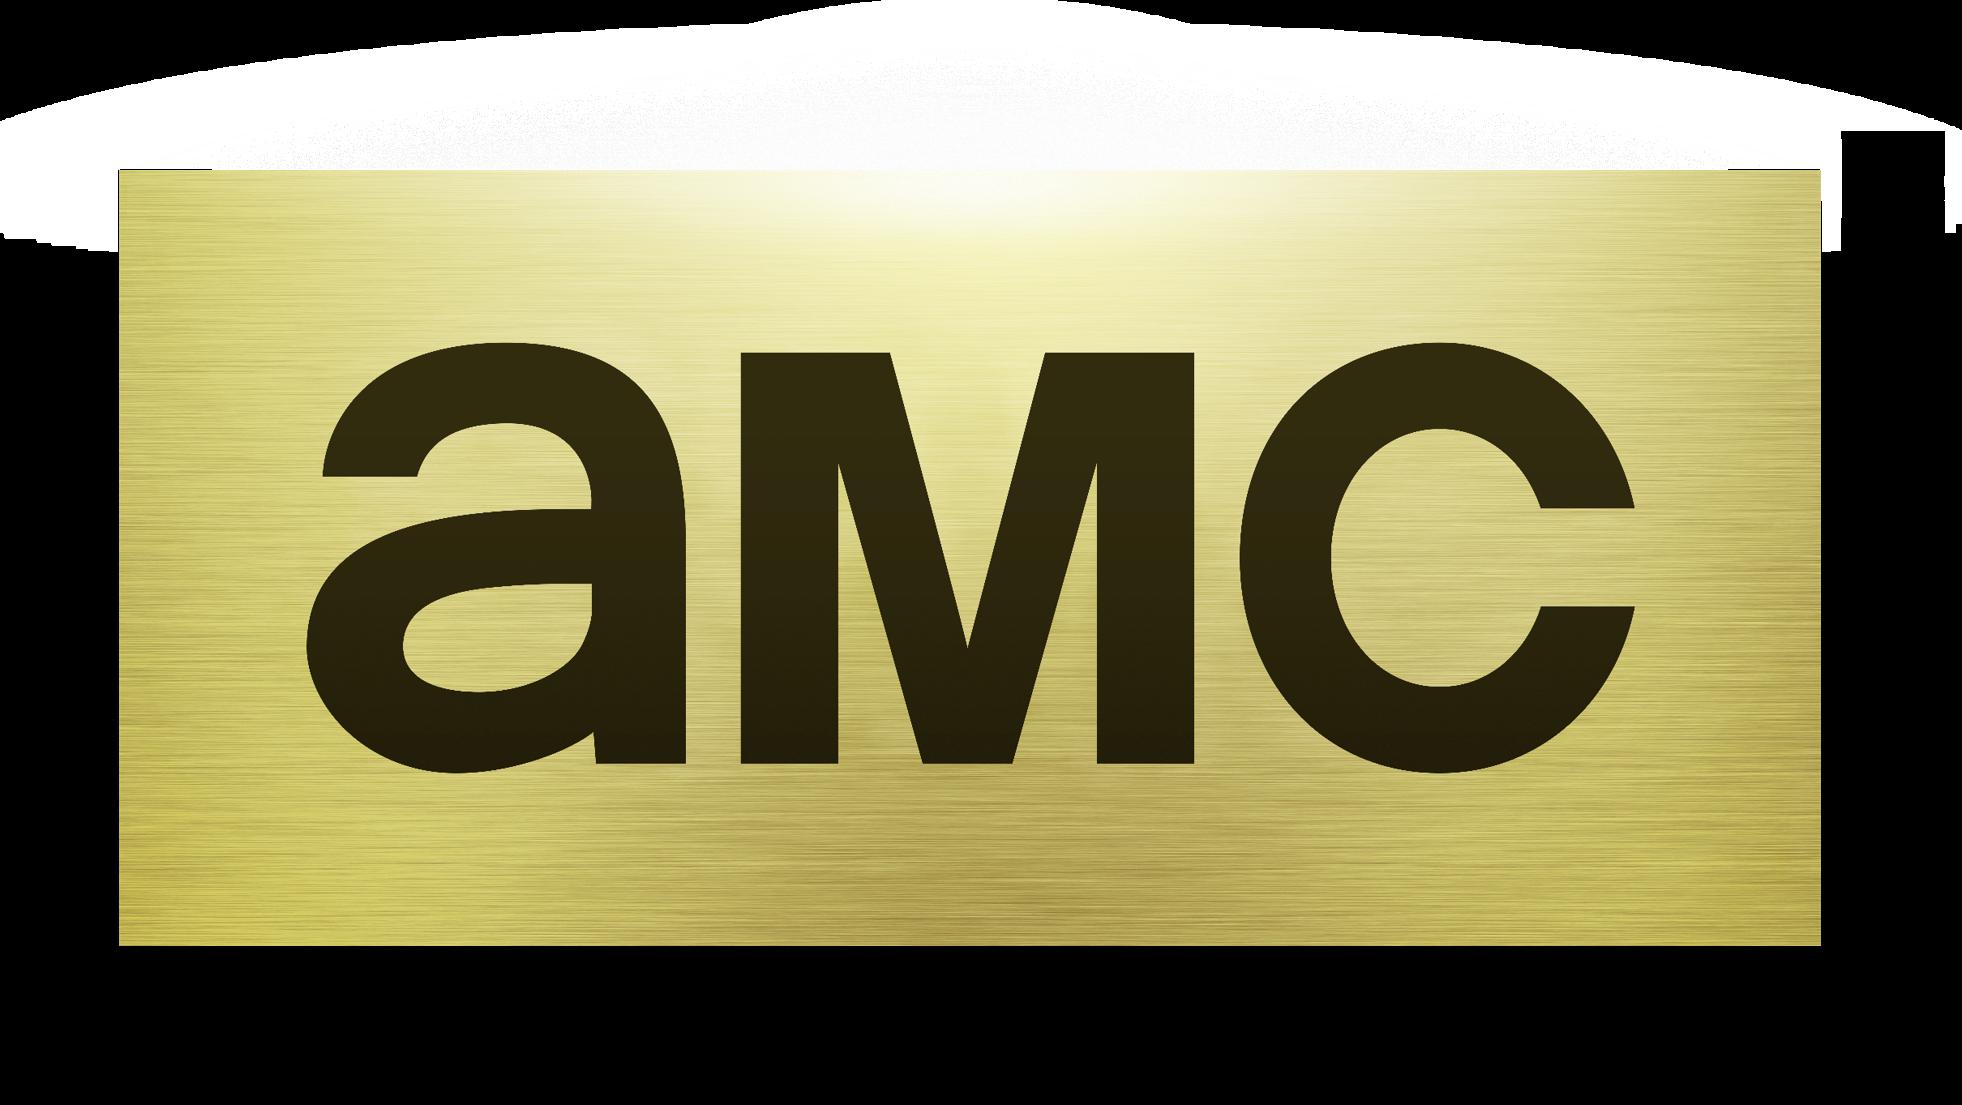 Amc movie channel website